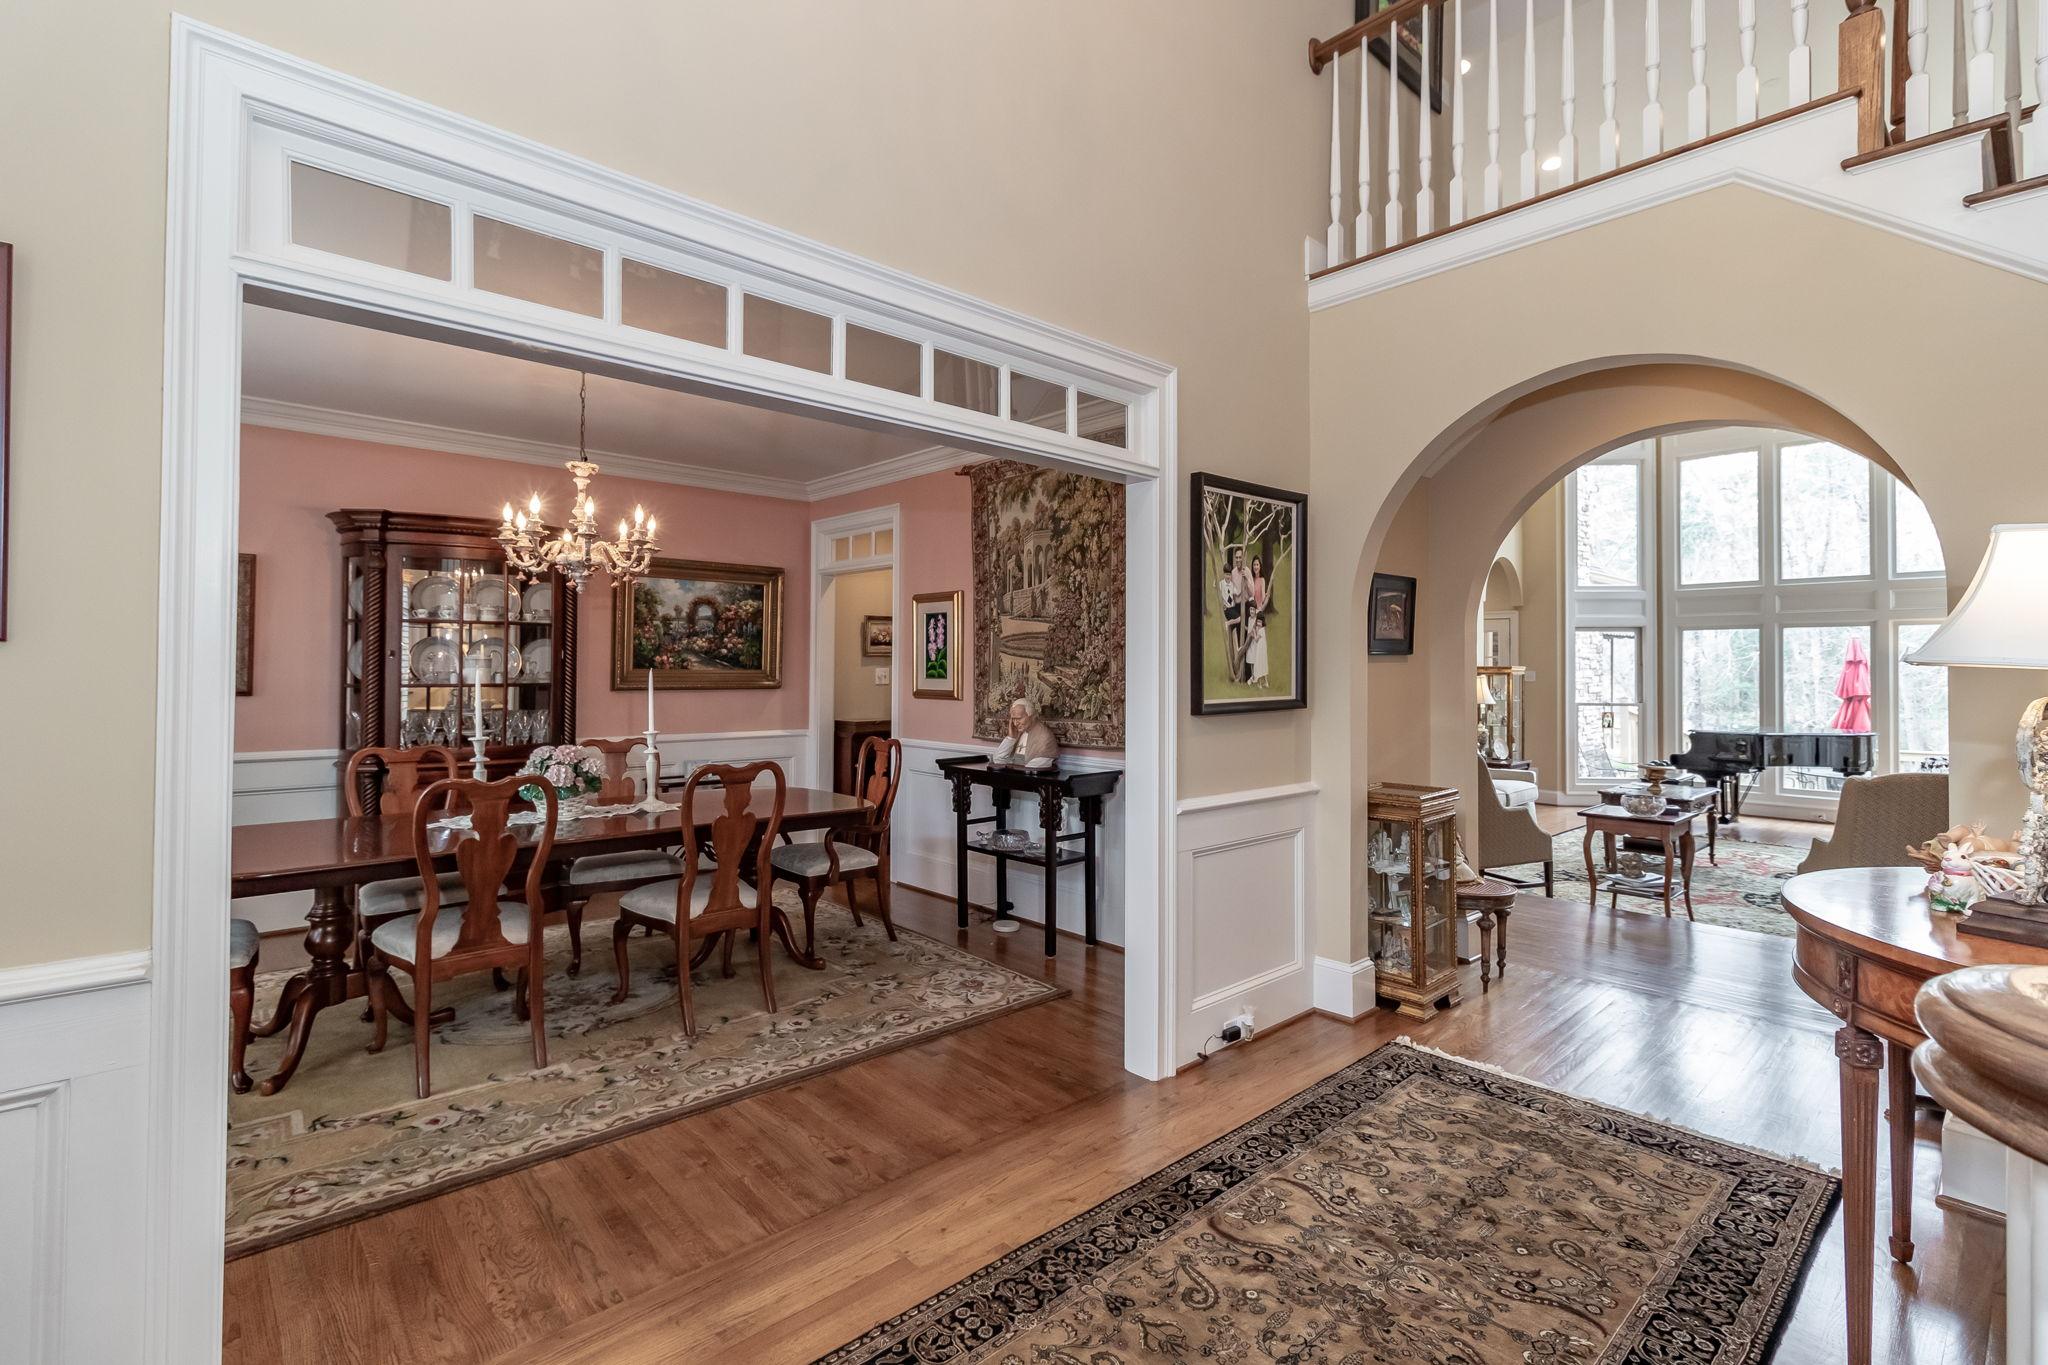 Entryway - Dining Room